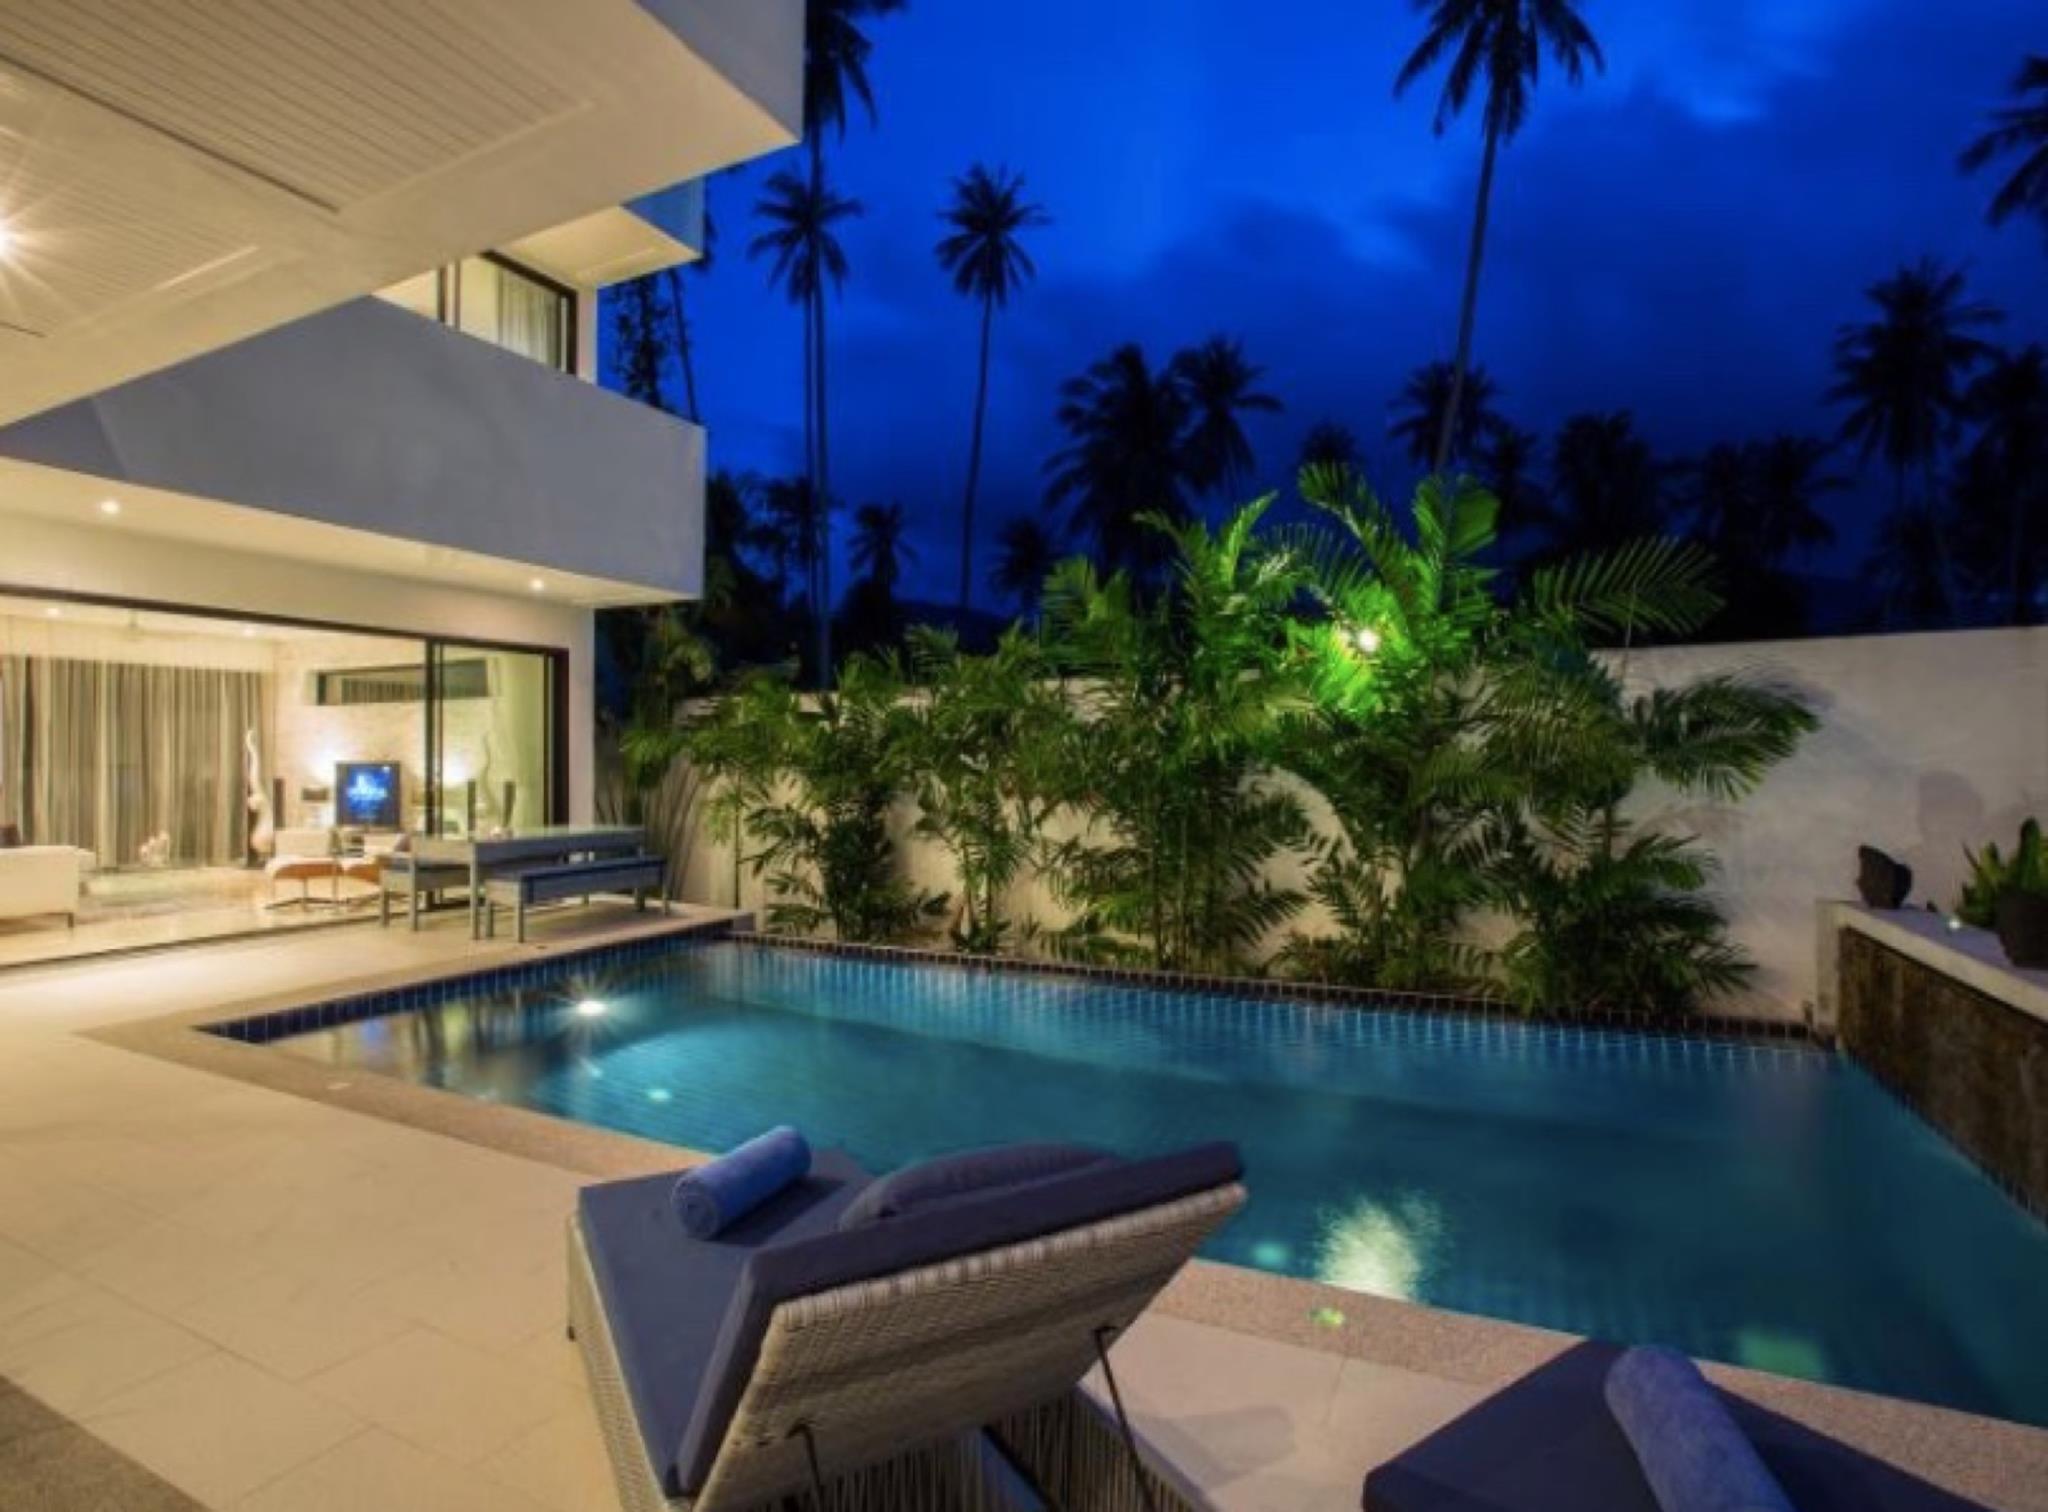 3 Bedroom Luxury 5* Villa   5 Mins Walk To Beach